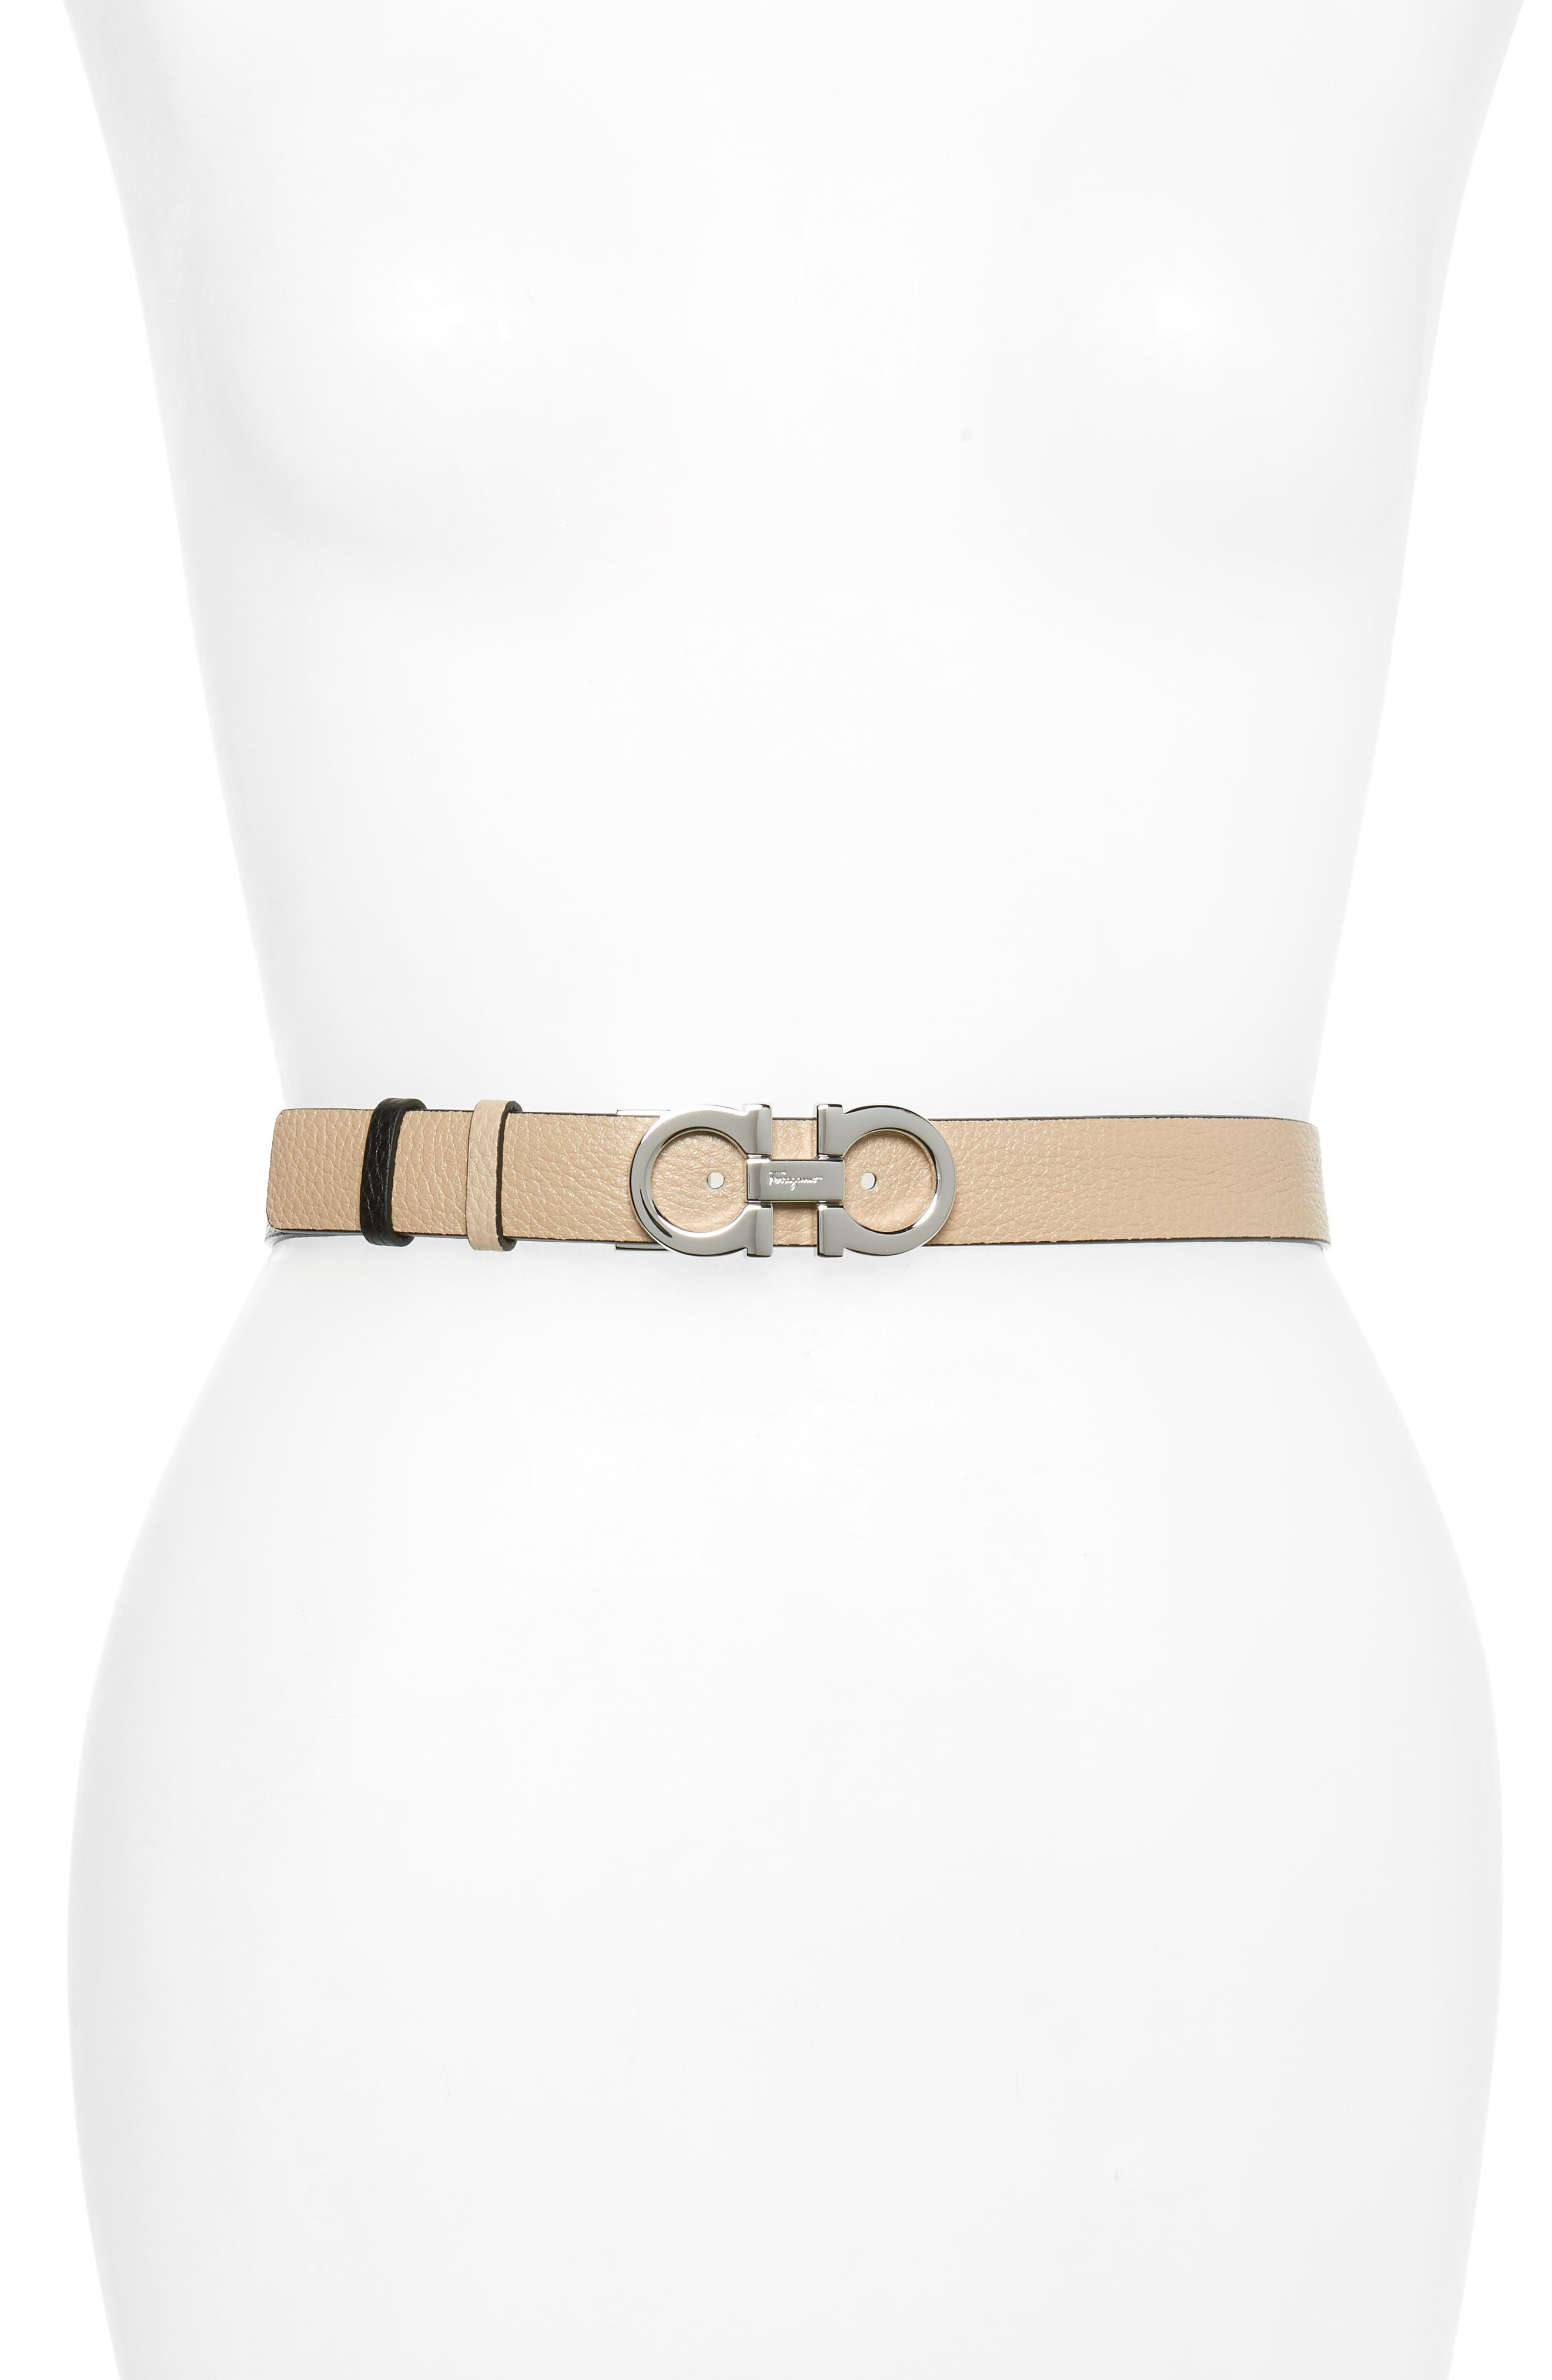 Salvatore Ferragamo Double Gancio Reversible Leather Belt, New Bisque/ Nero